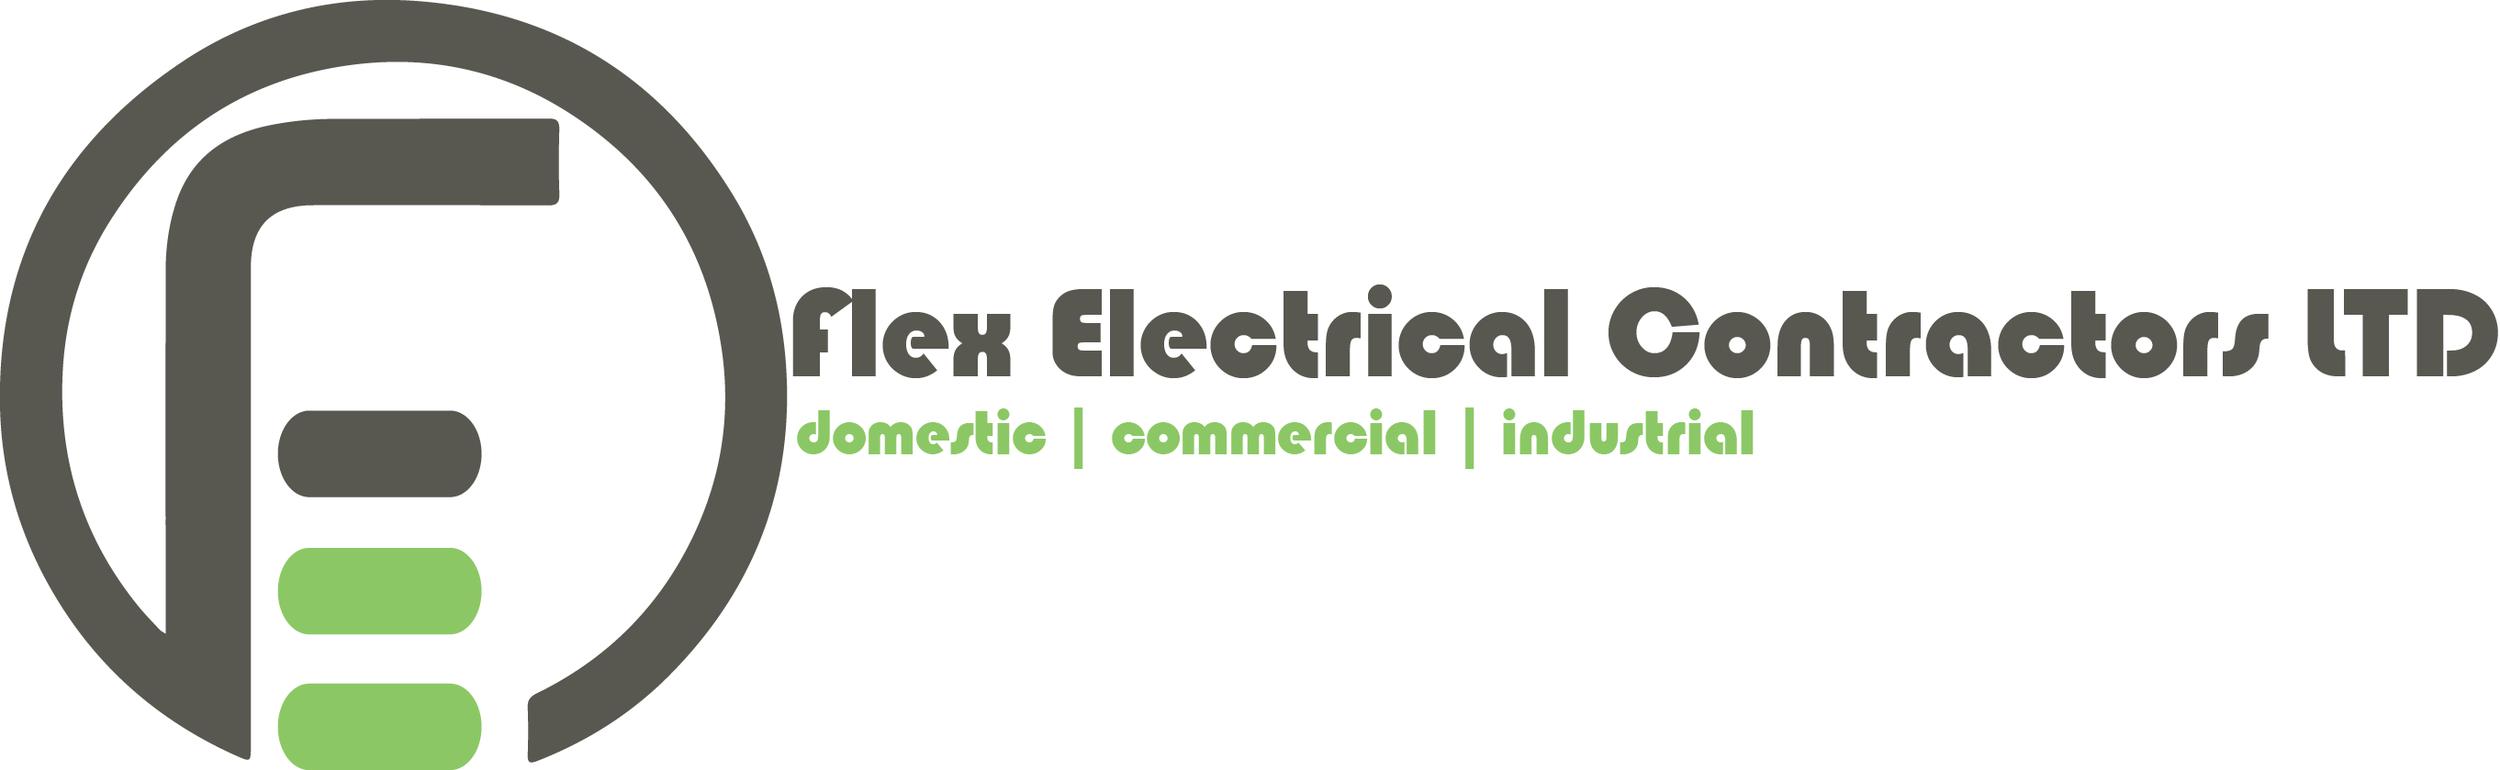 Flex logo and font.png